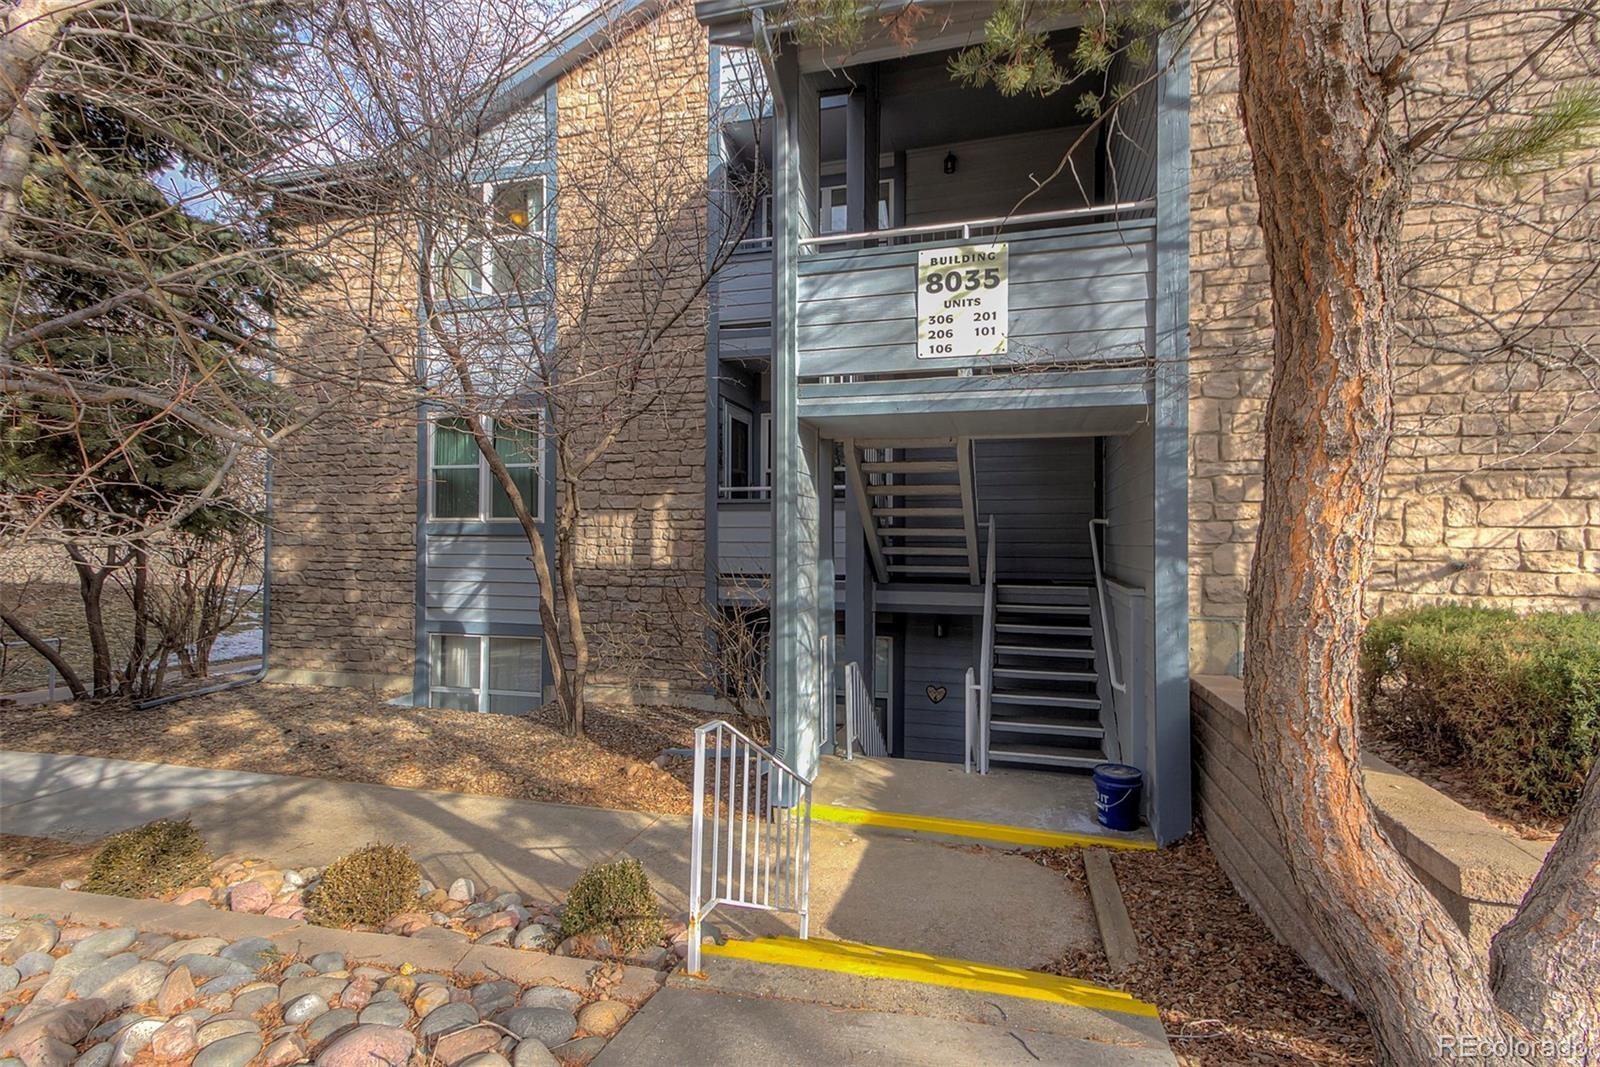 MLS# 3356784 - 2 - 8035 W Eastman Place #306, Lakewood, CO 80227